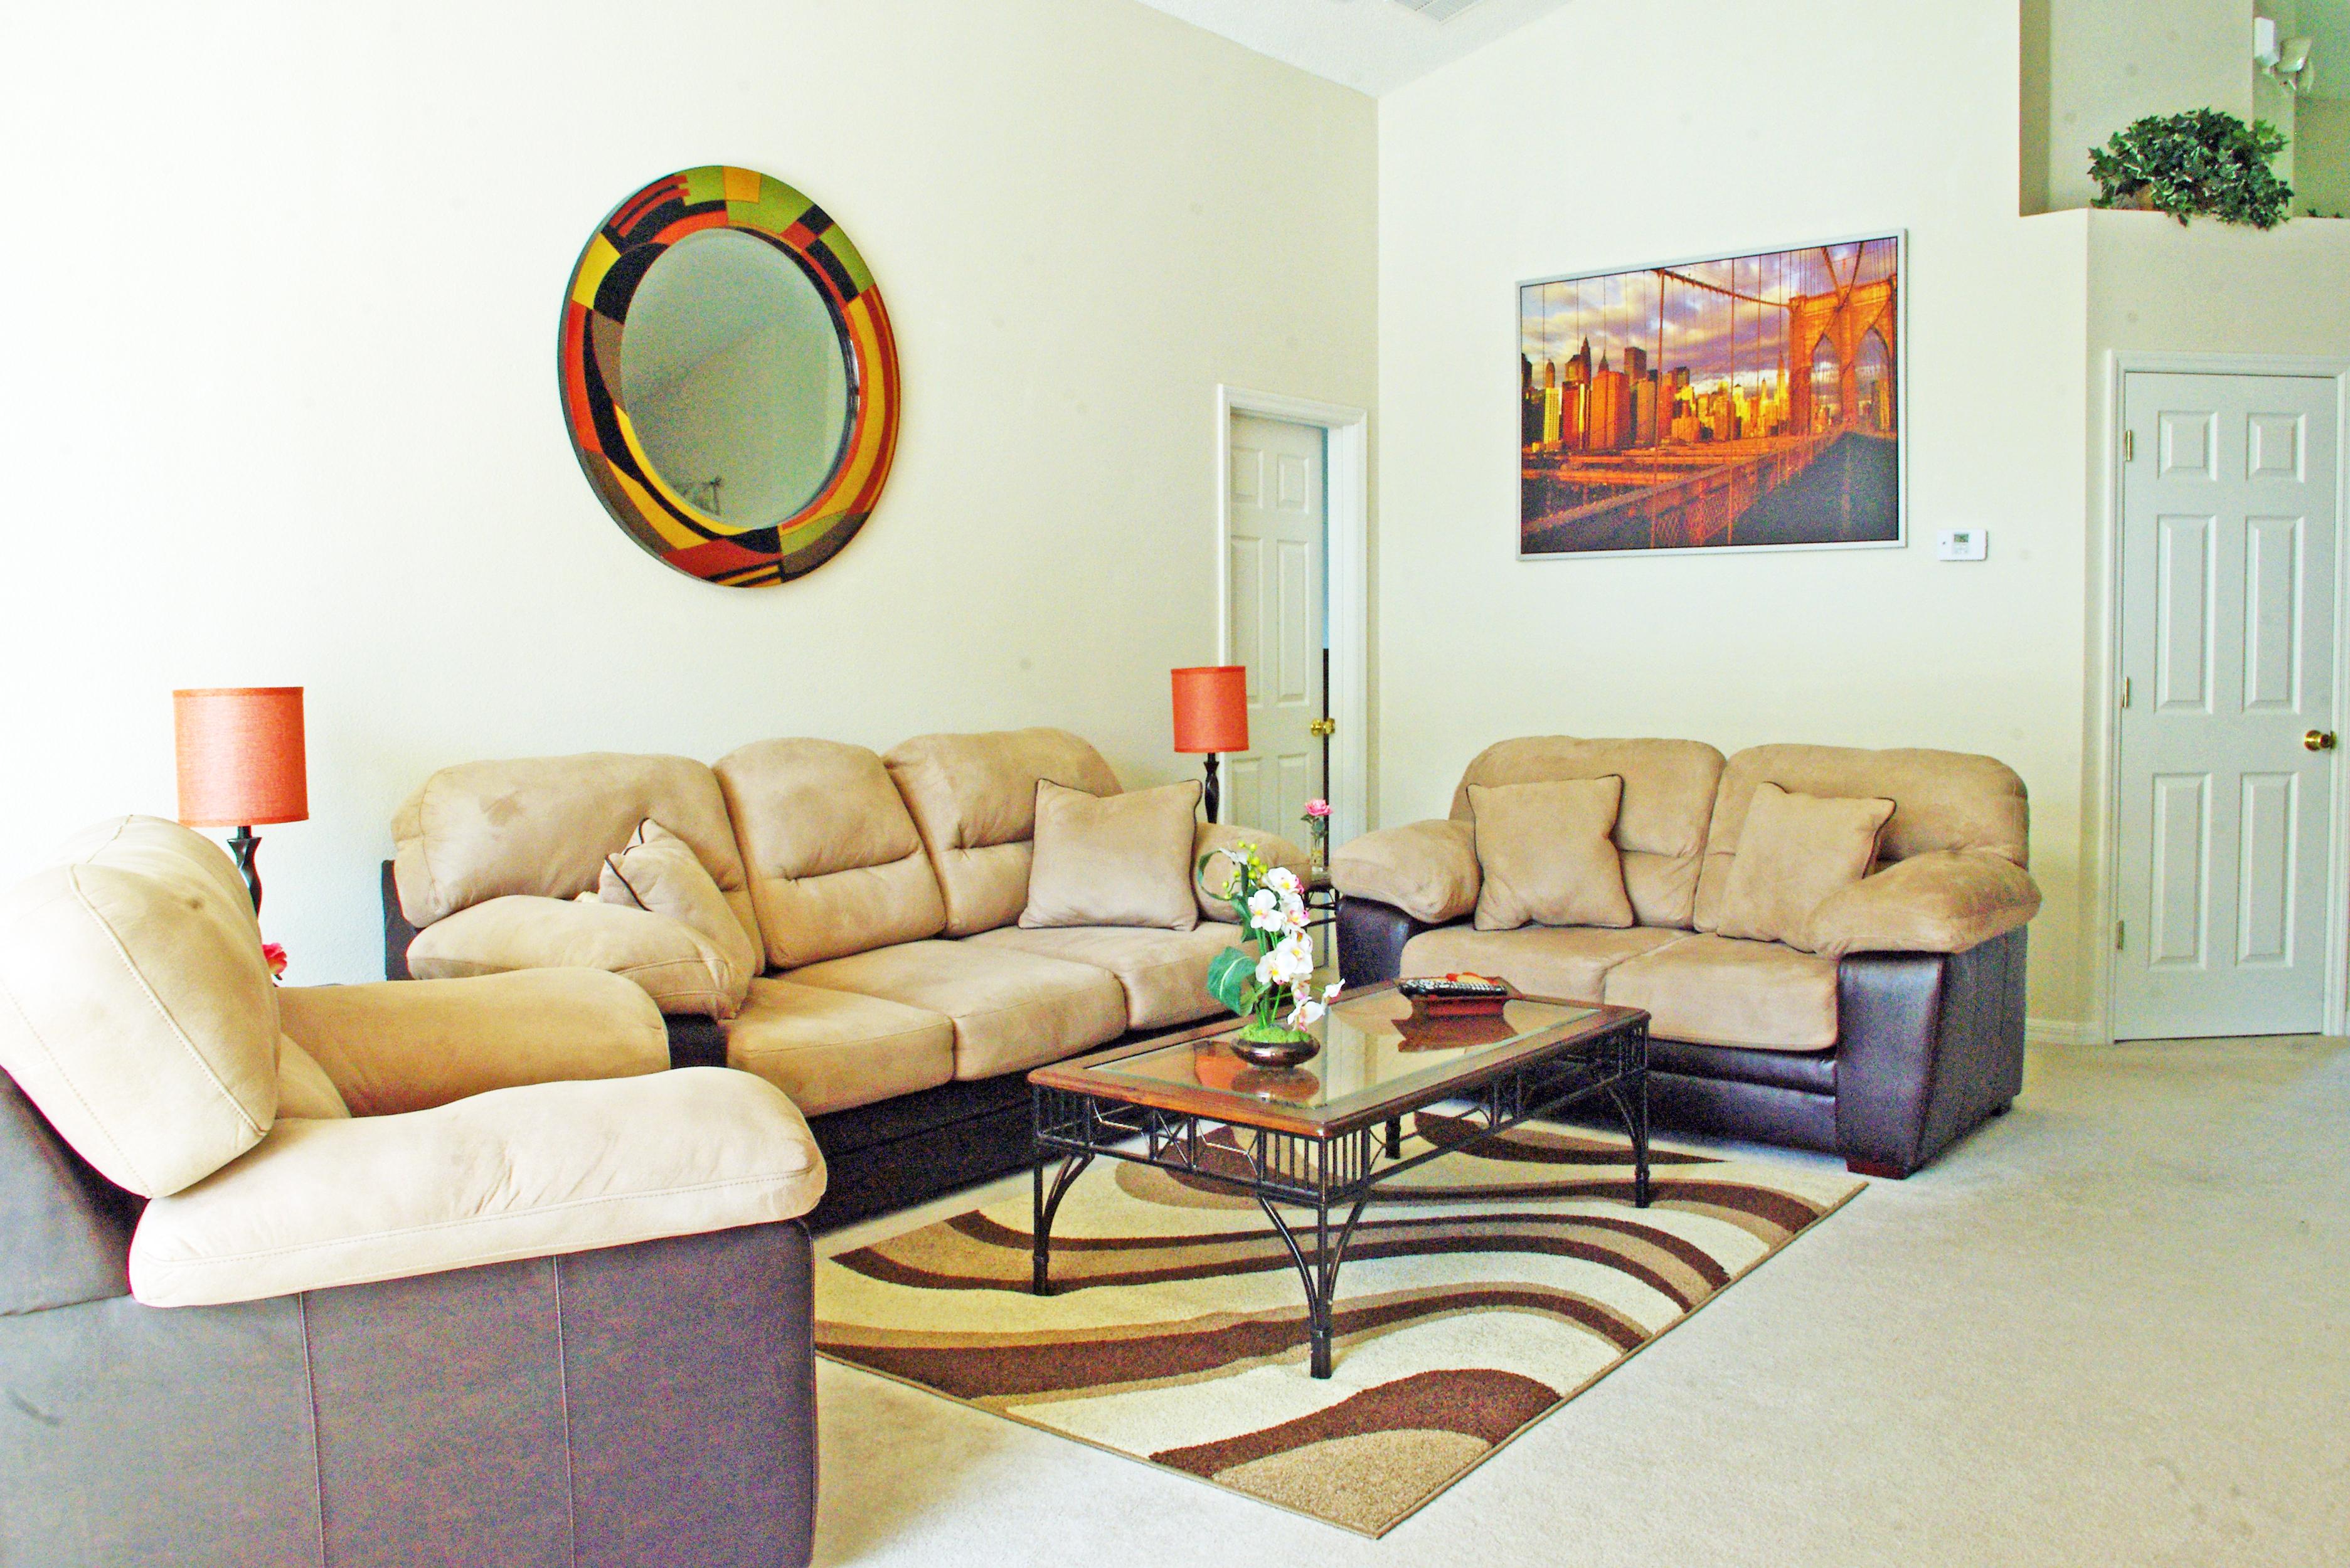 clarke florida rental villa (3)